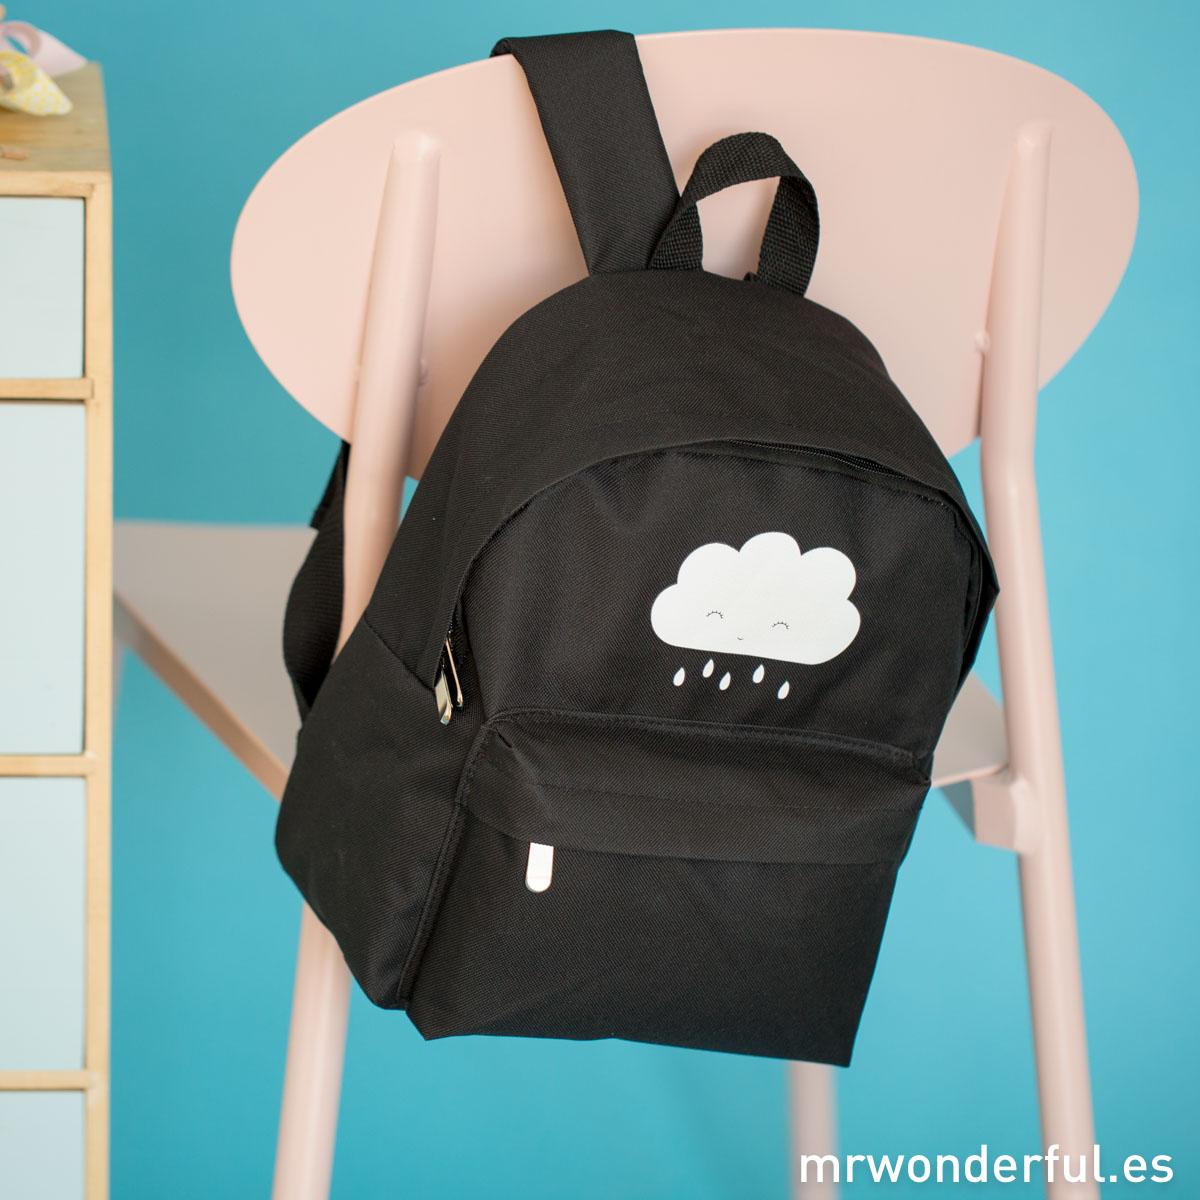 mrwonderful_PRA02820_Mochila-infantil-Cloud-27-2